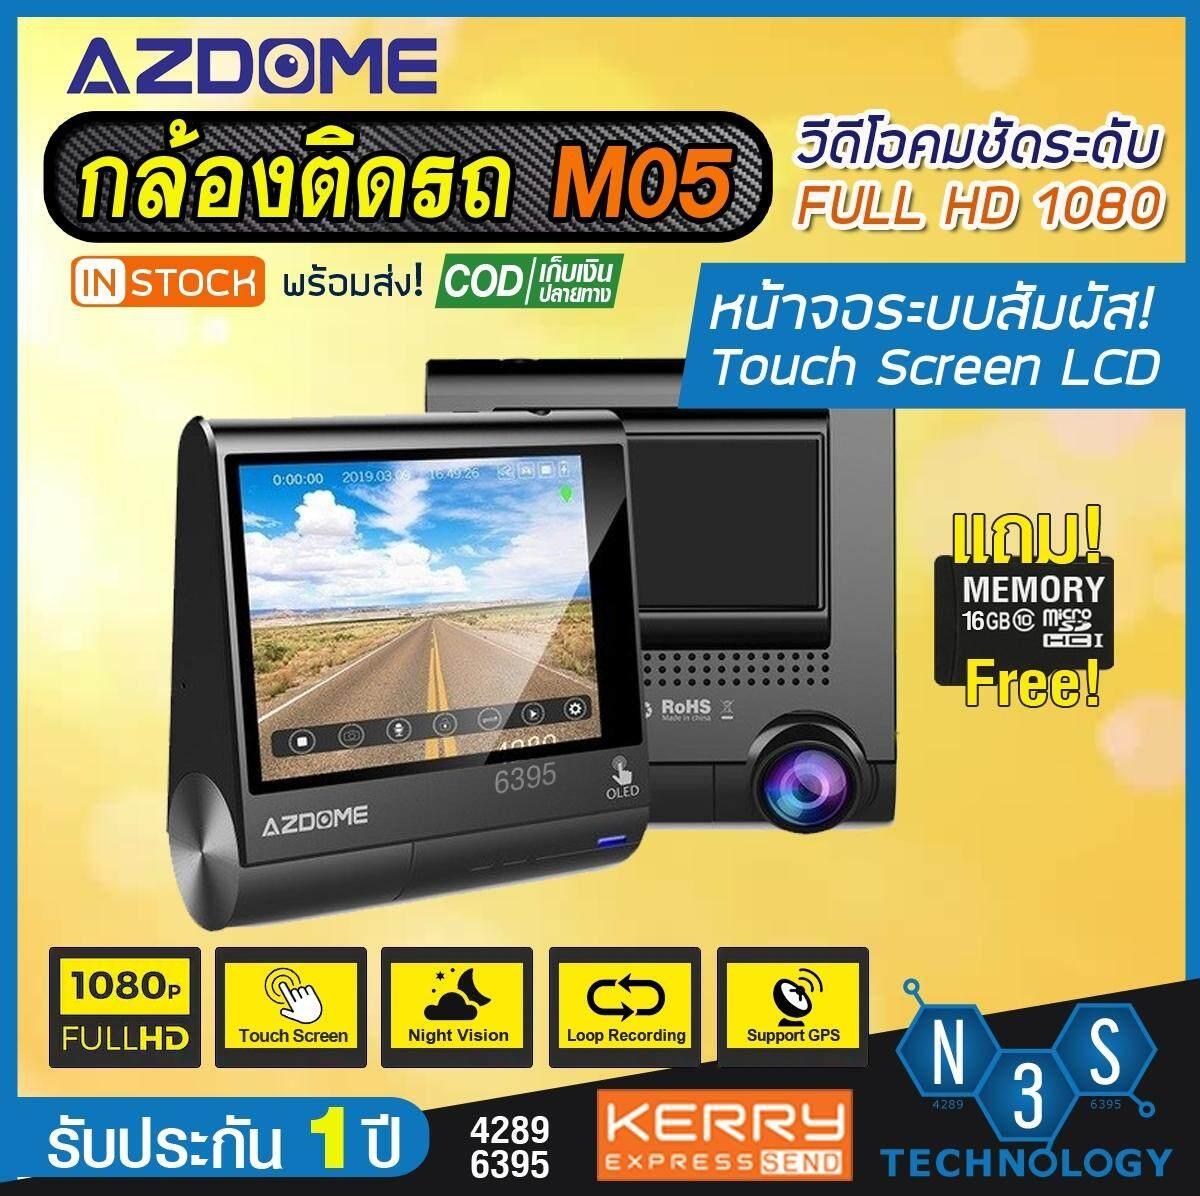 Dashcam กล้องติดรถยนต์ Azdome รุ่น M05 หน้าจอทัช OLED 3 นิ้ว ความละเอียด FHD1080P พร้อม GPS ระบุพิกัด และ ความเร็วรถ รองรับภาษาไทย ประกัน 1 ปี เต็ม (แถม Free SD Card 16 GB)